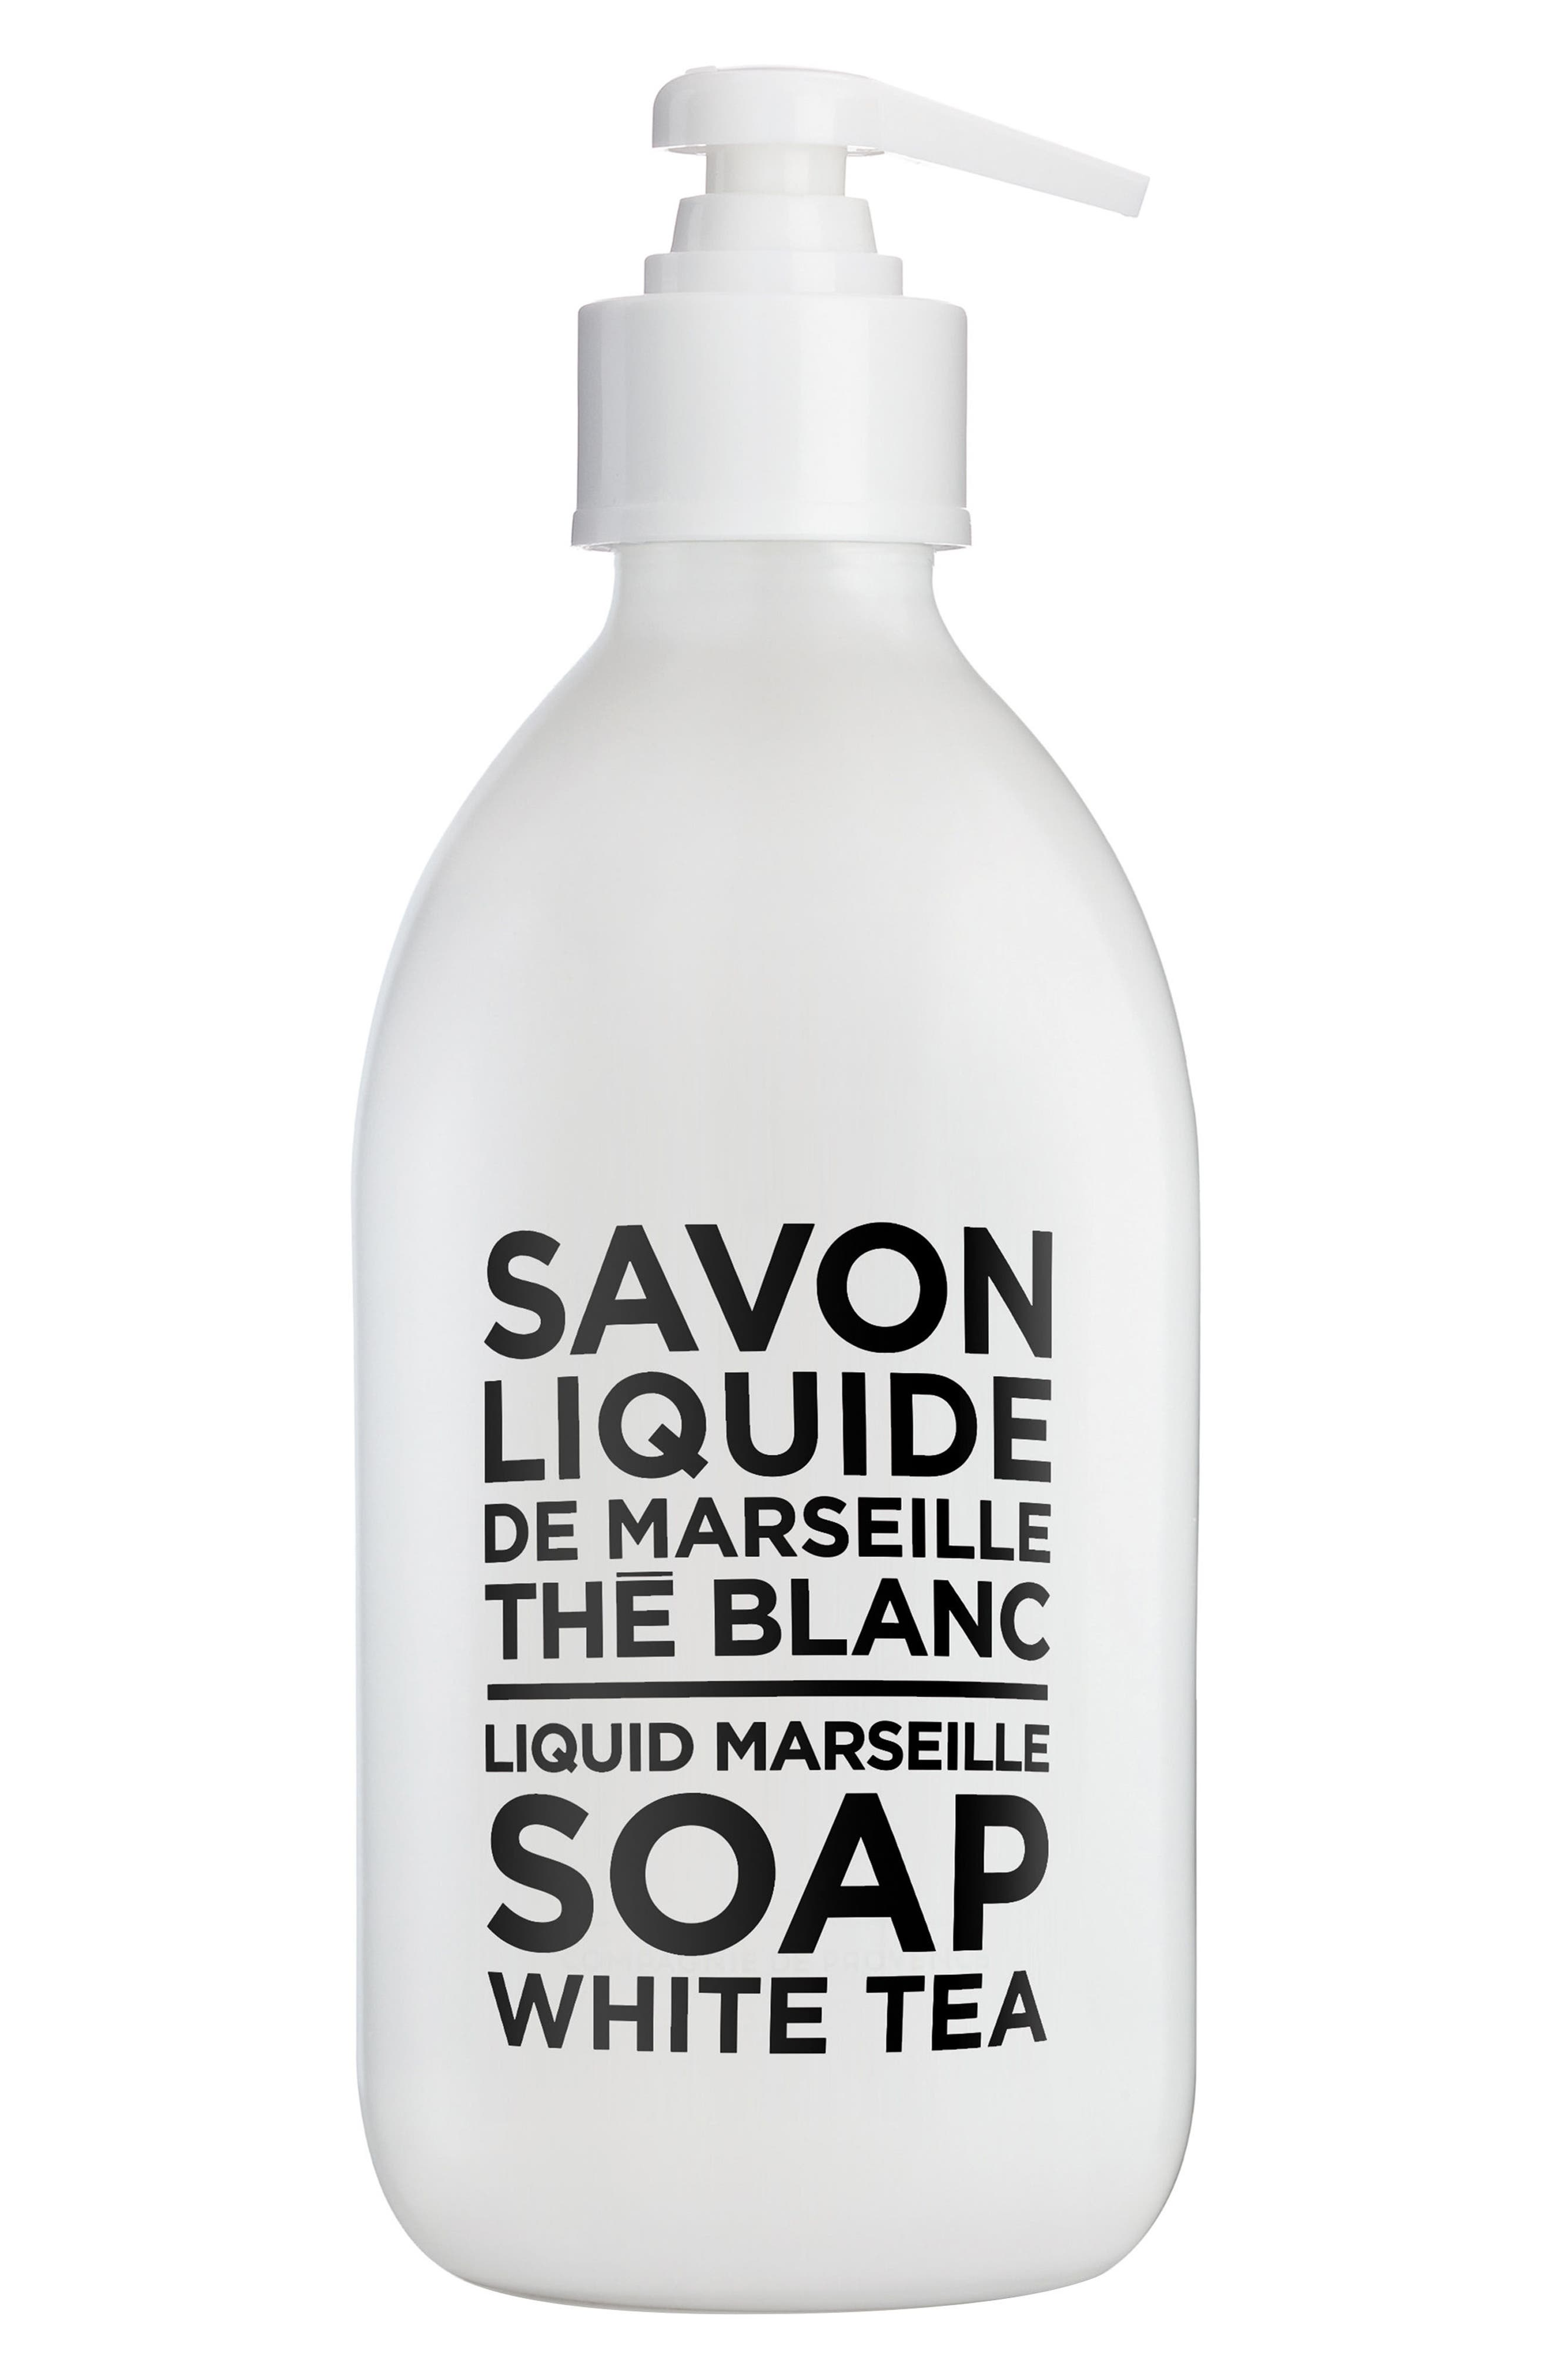 White Tea Liquid Marseille Soap,                         Main,                         color, No Color